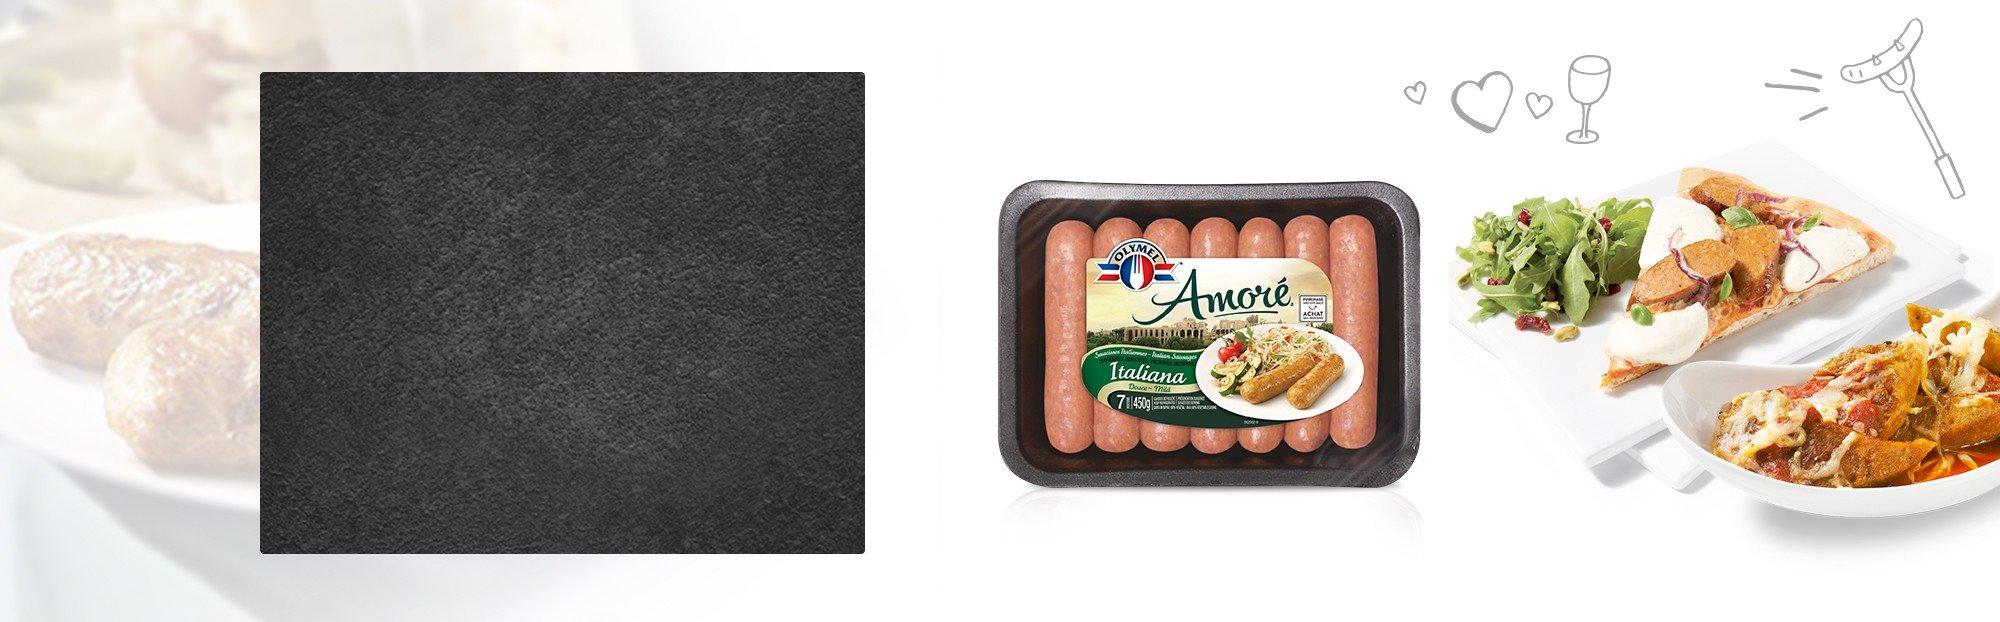 Amoré Sausages Mild Italian